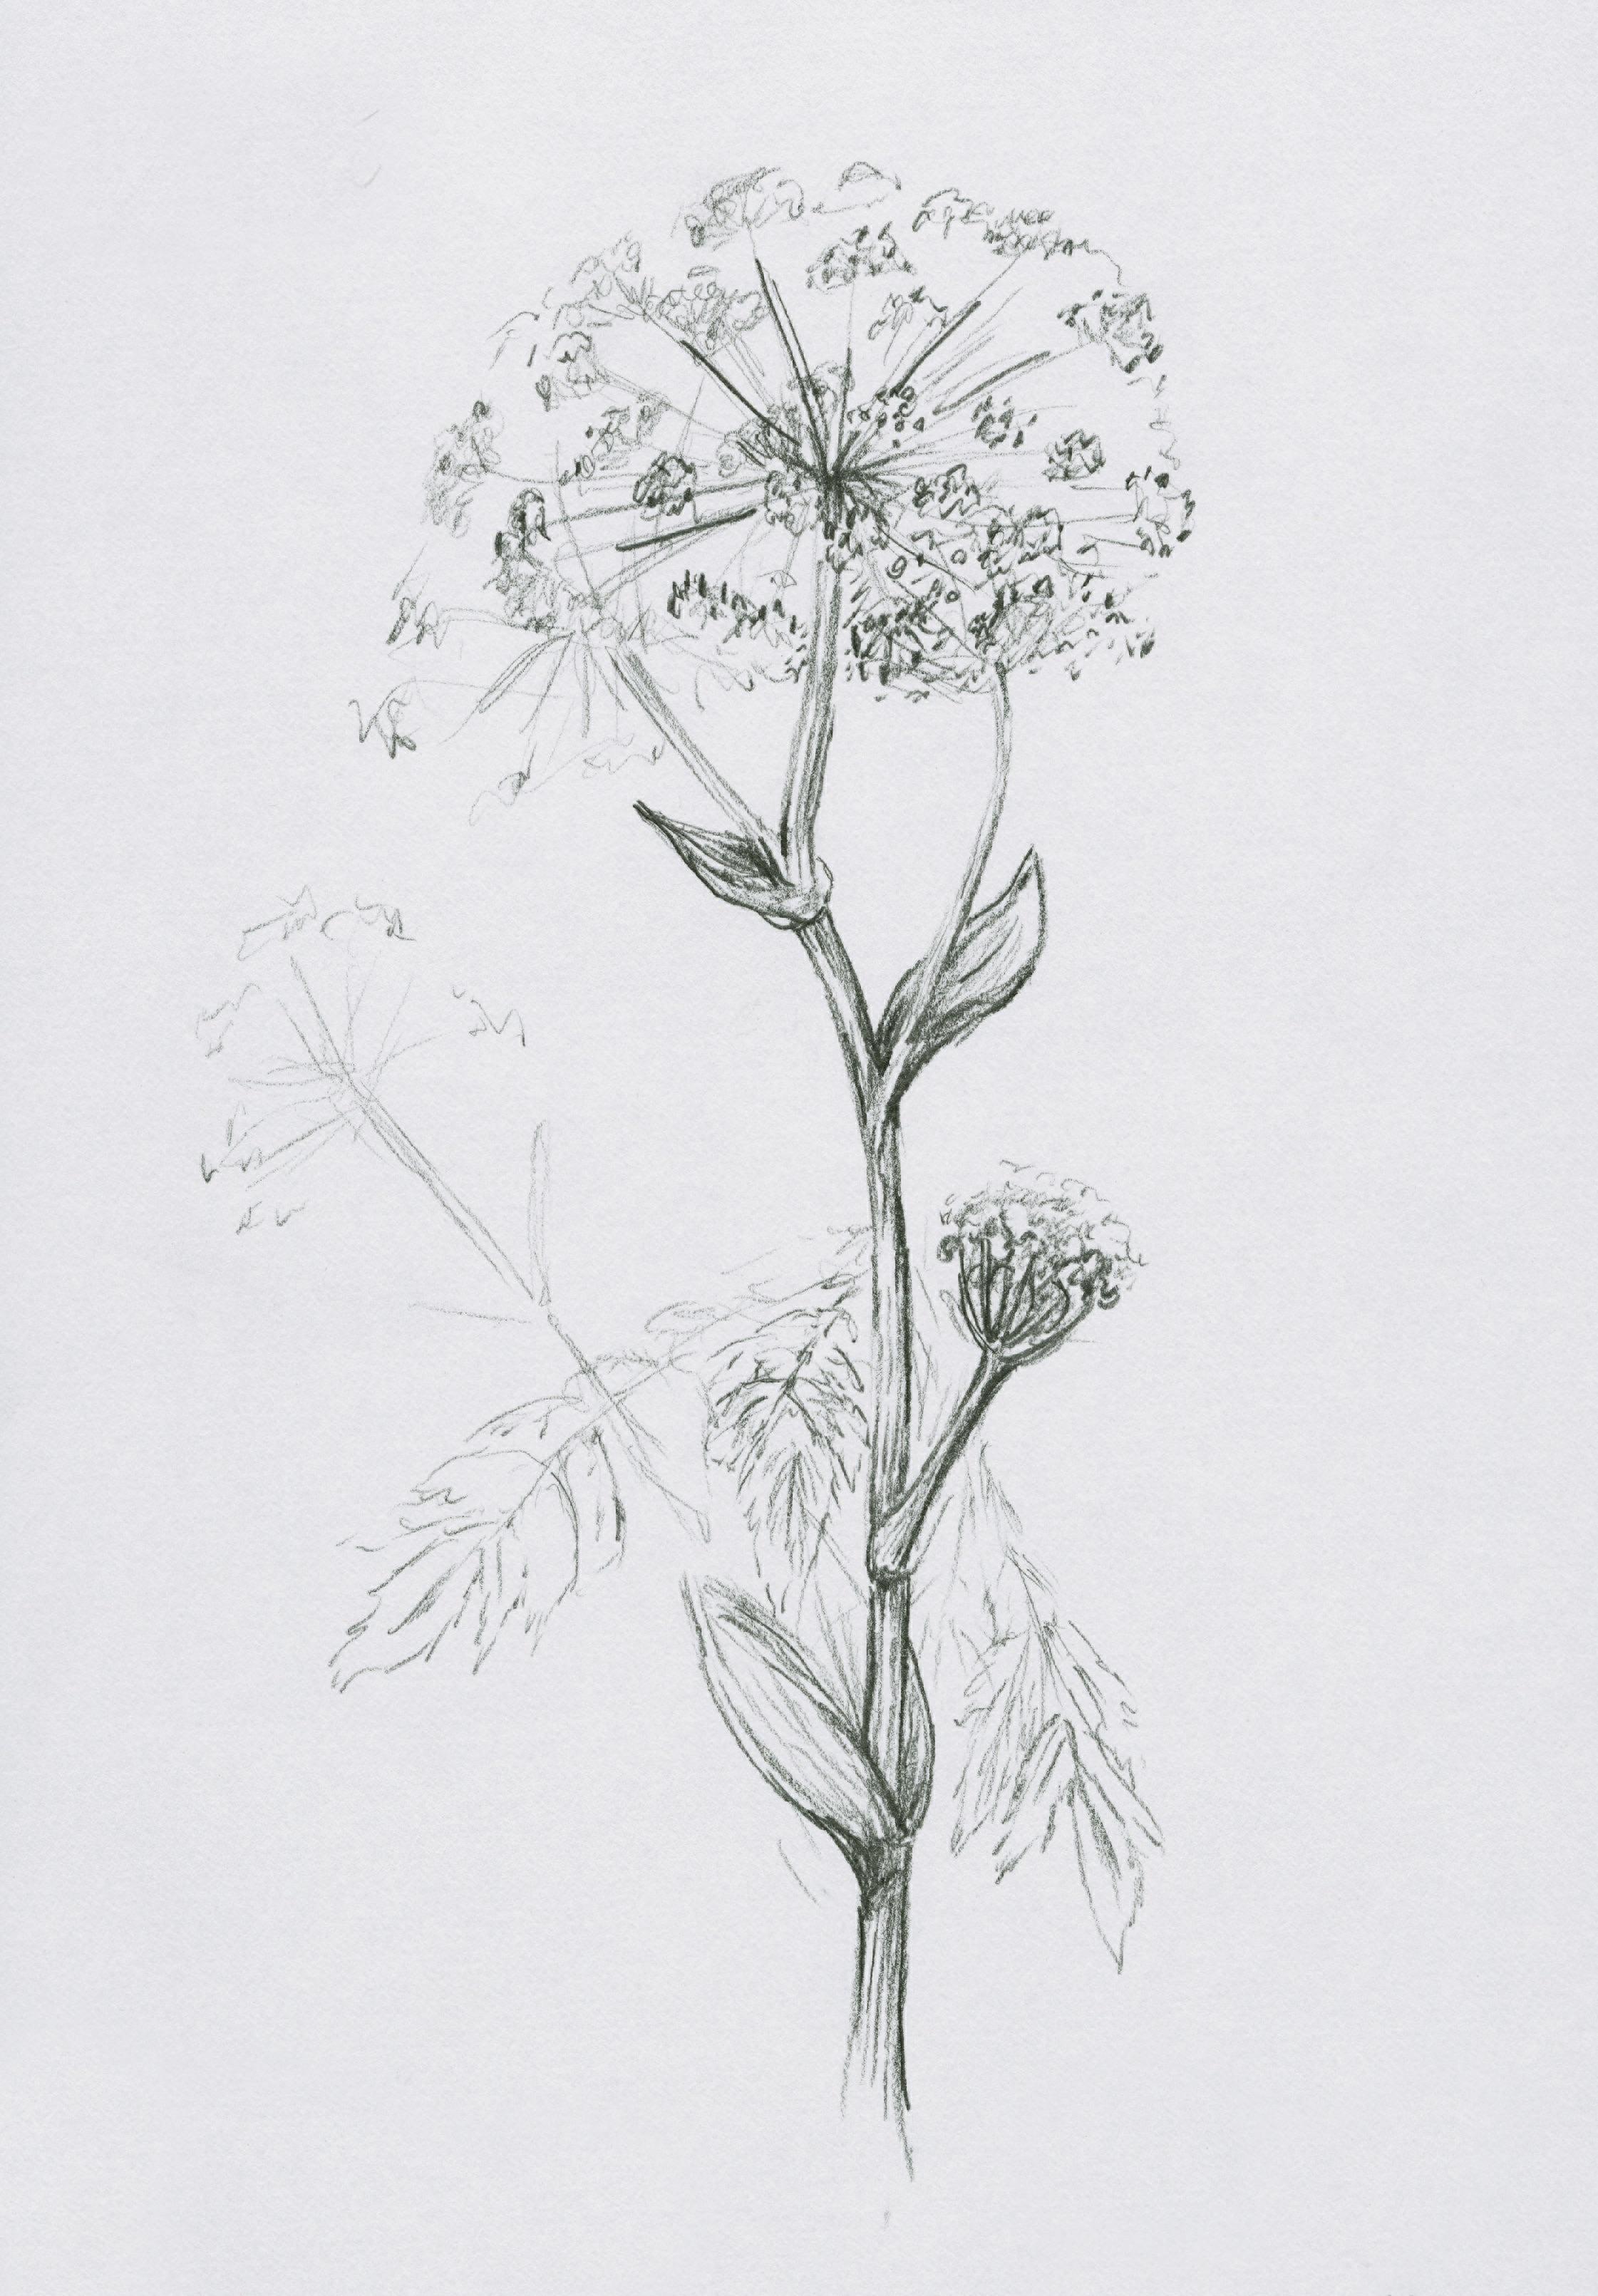 Baizhi, drawing by Maria Hicks